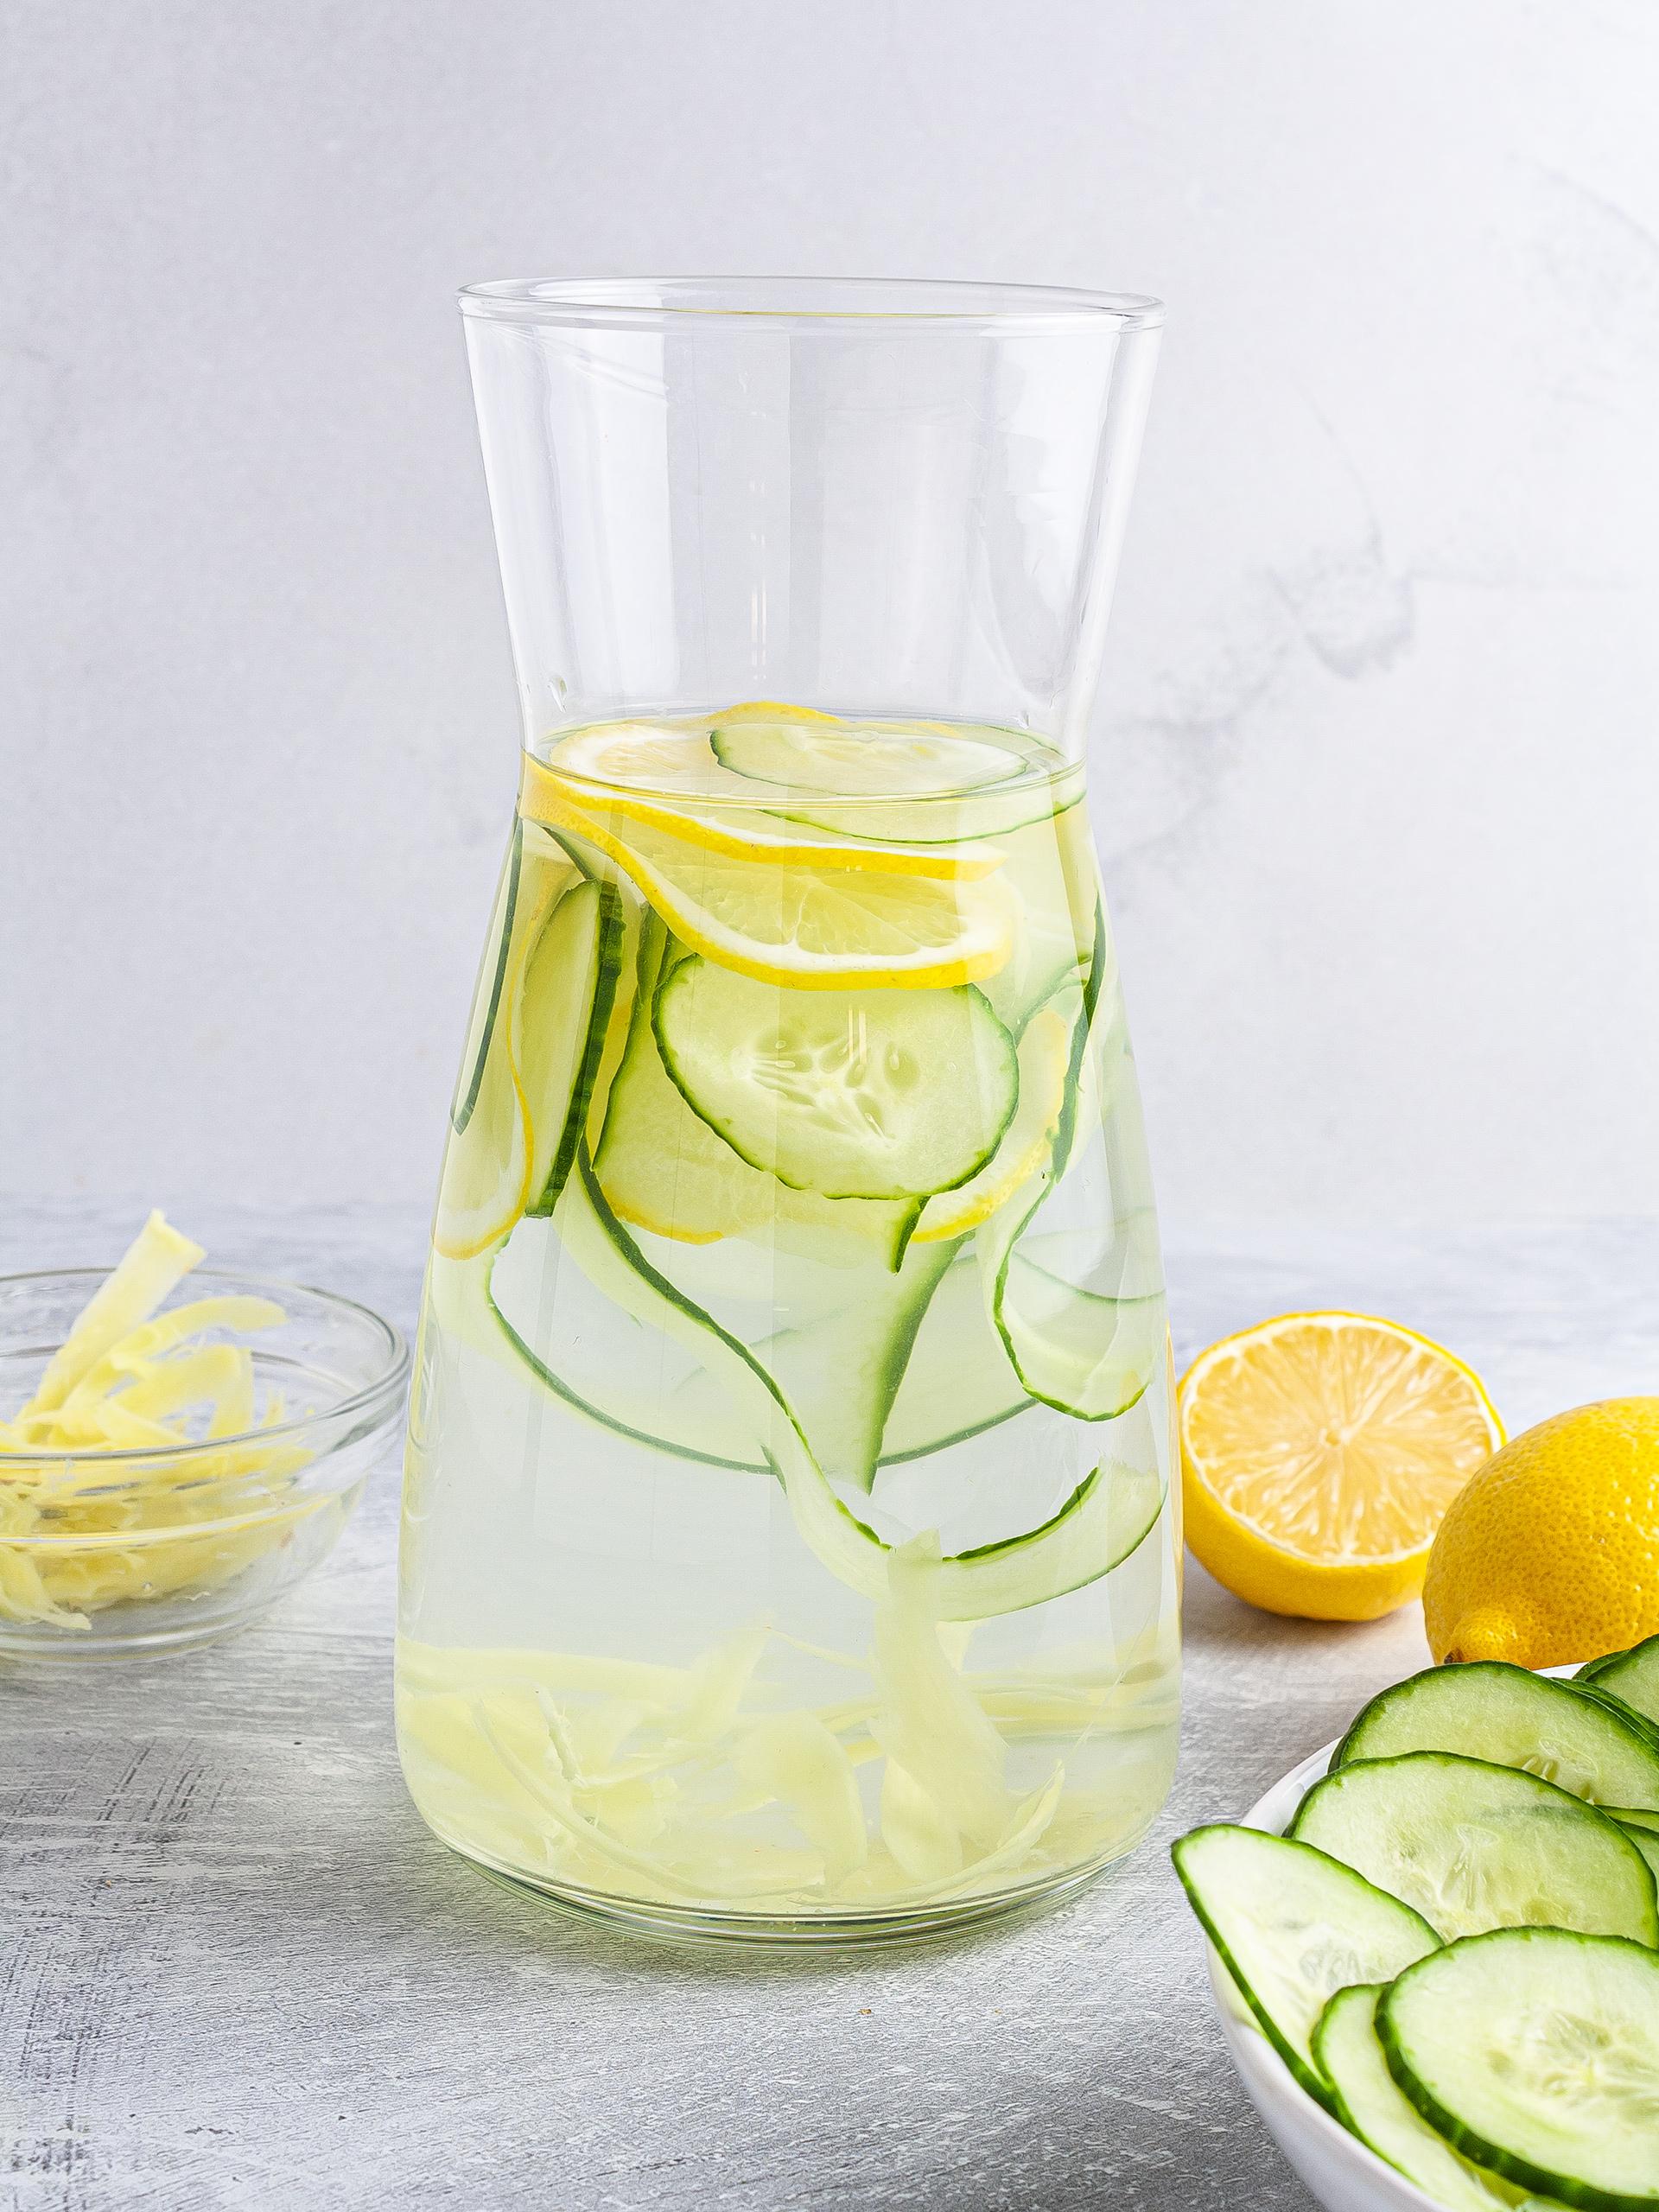 Cucumber ginger lemon water in a jug